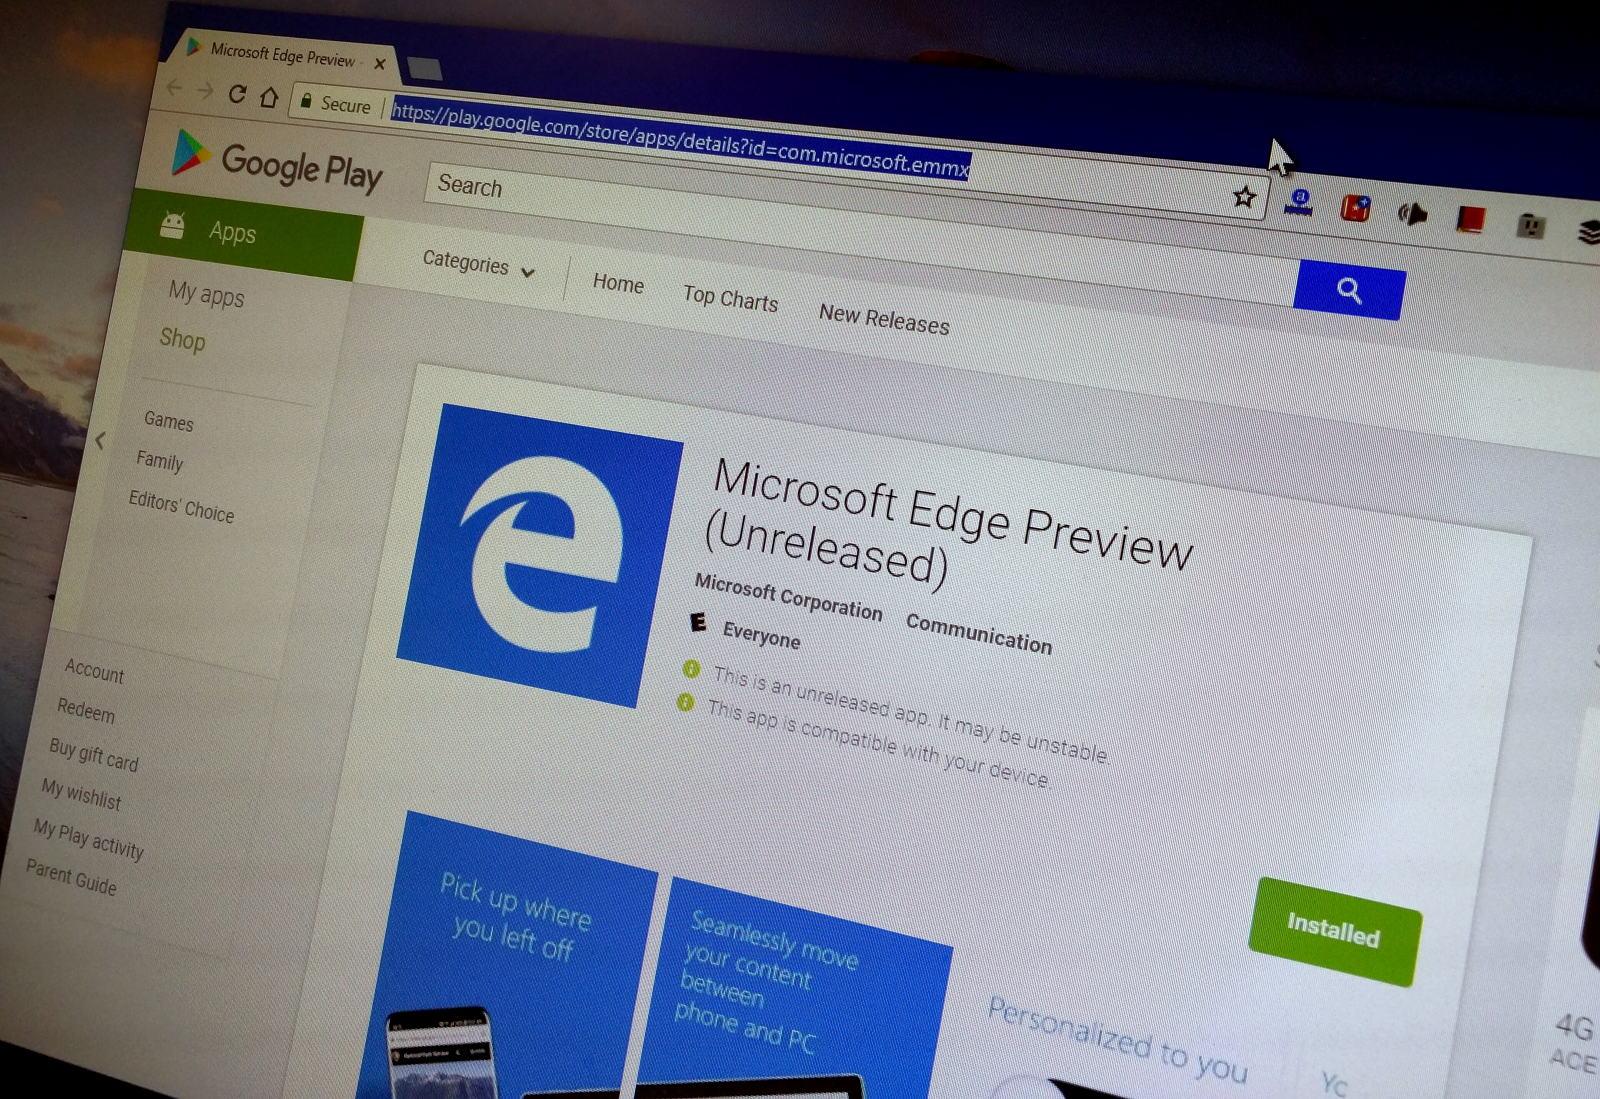 Microsoft Edge app on the Google Play Store